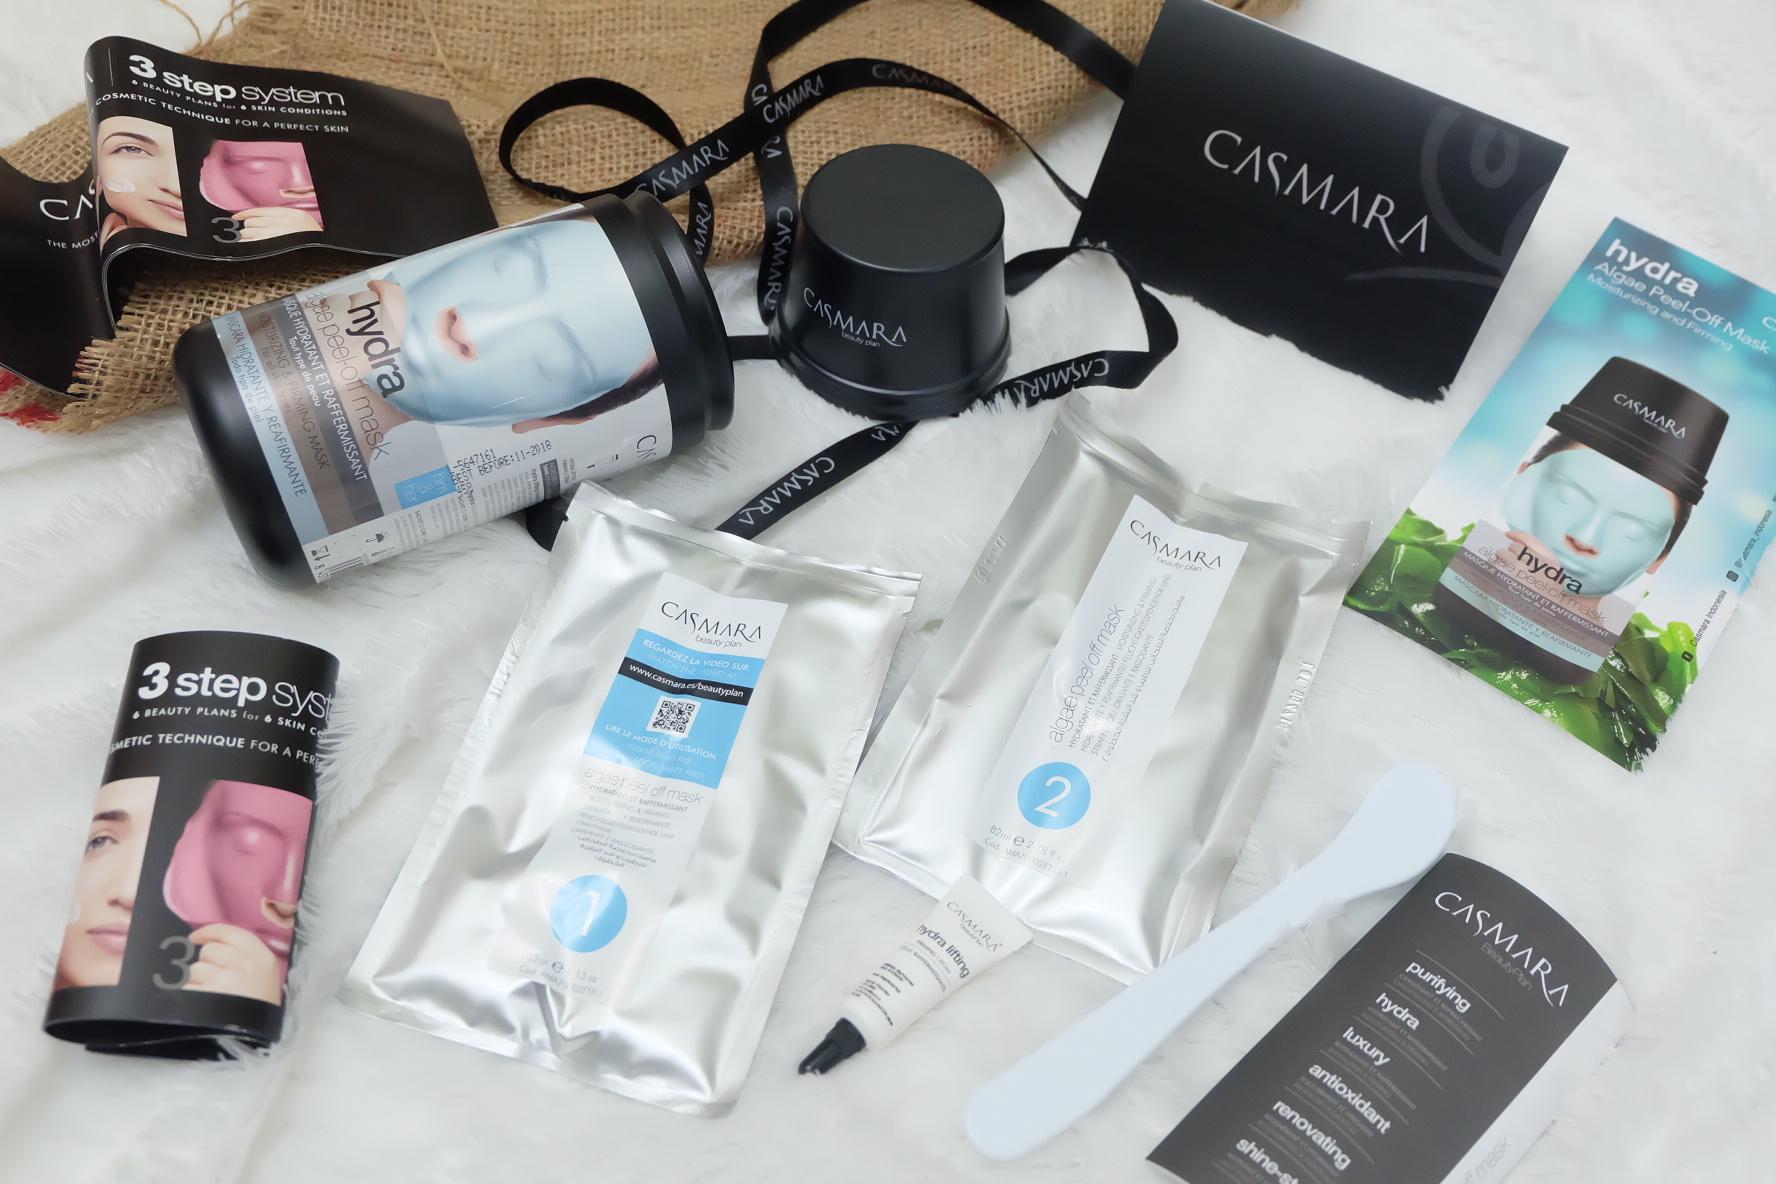 [Review] Casmara Hydra Algae Peel-Off Mask